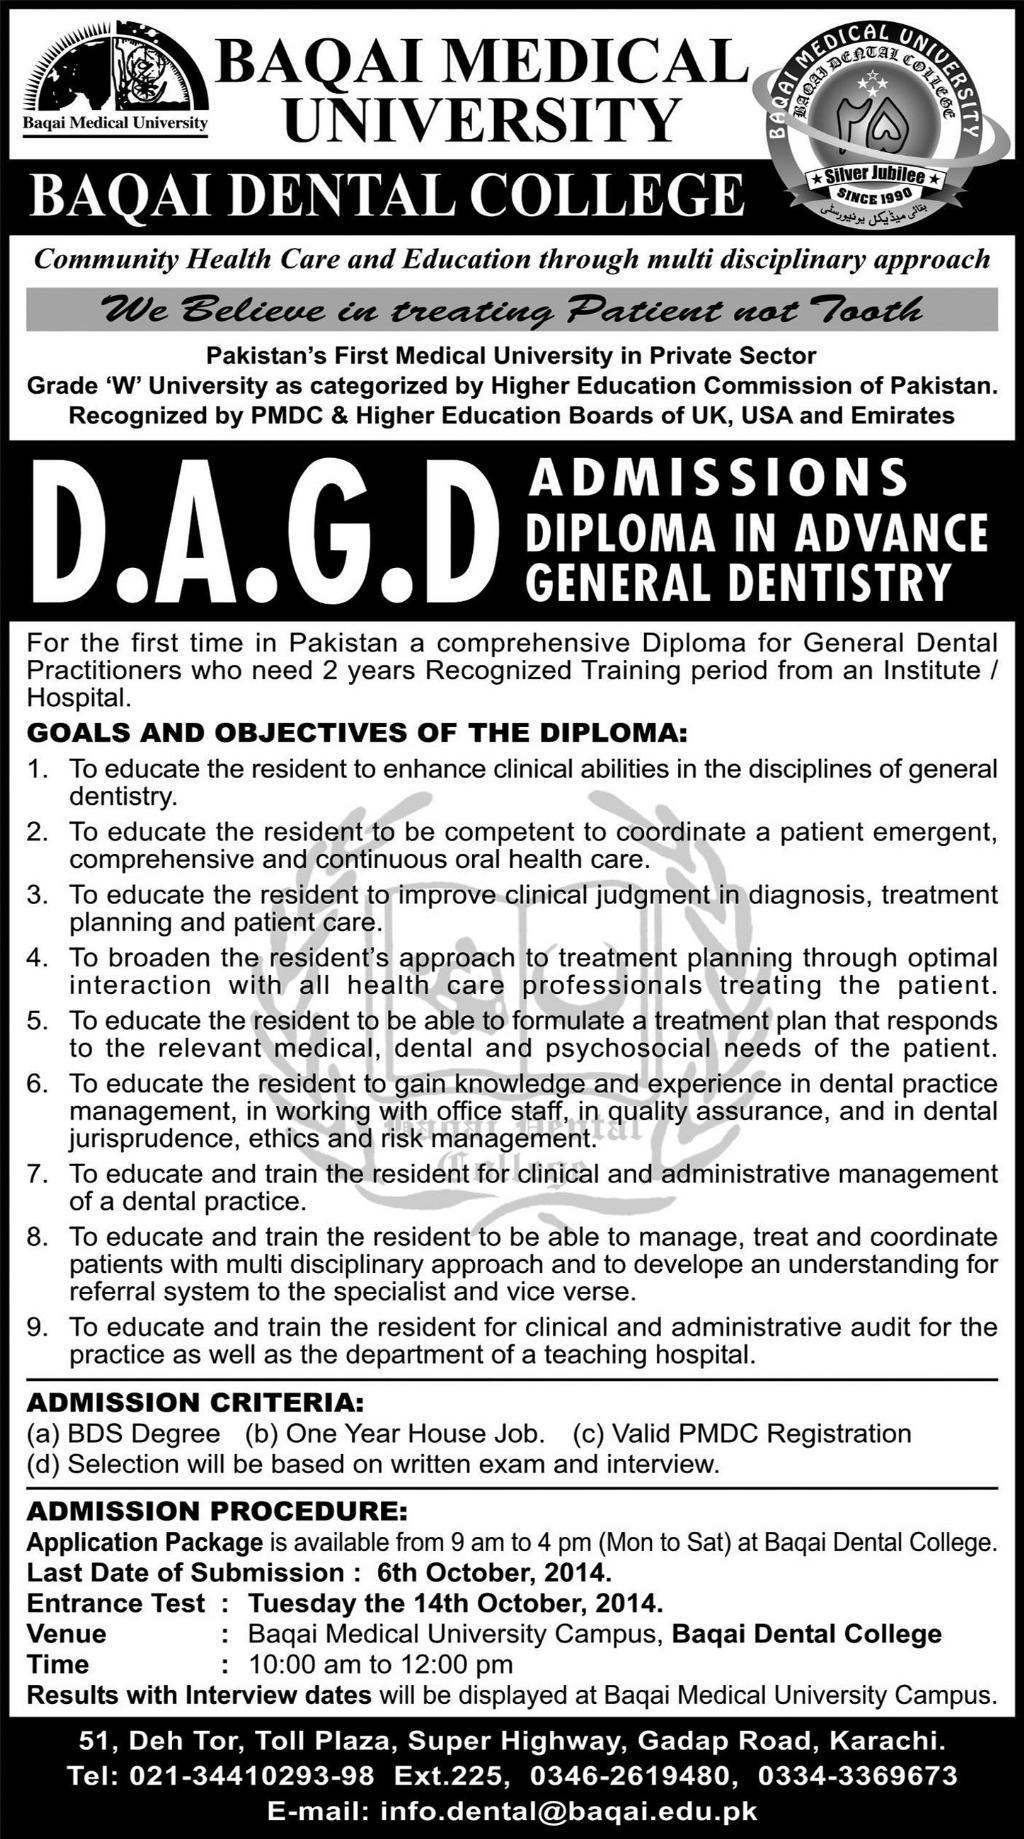 Baqai Medical University, Baqai Dental College Karachi Admission Notice 2014-2015 for Diploma in Advance General Dentistry (DAGD)